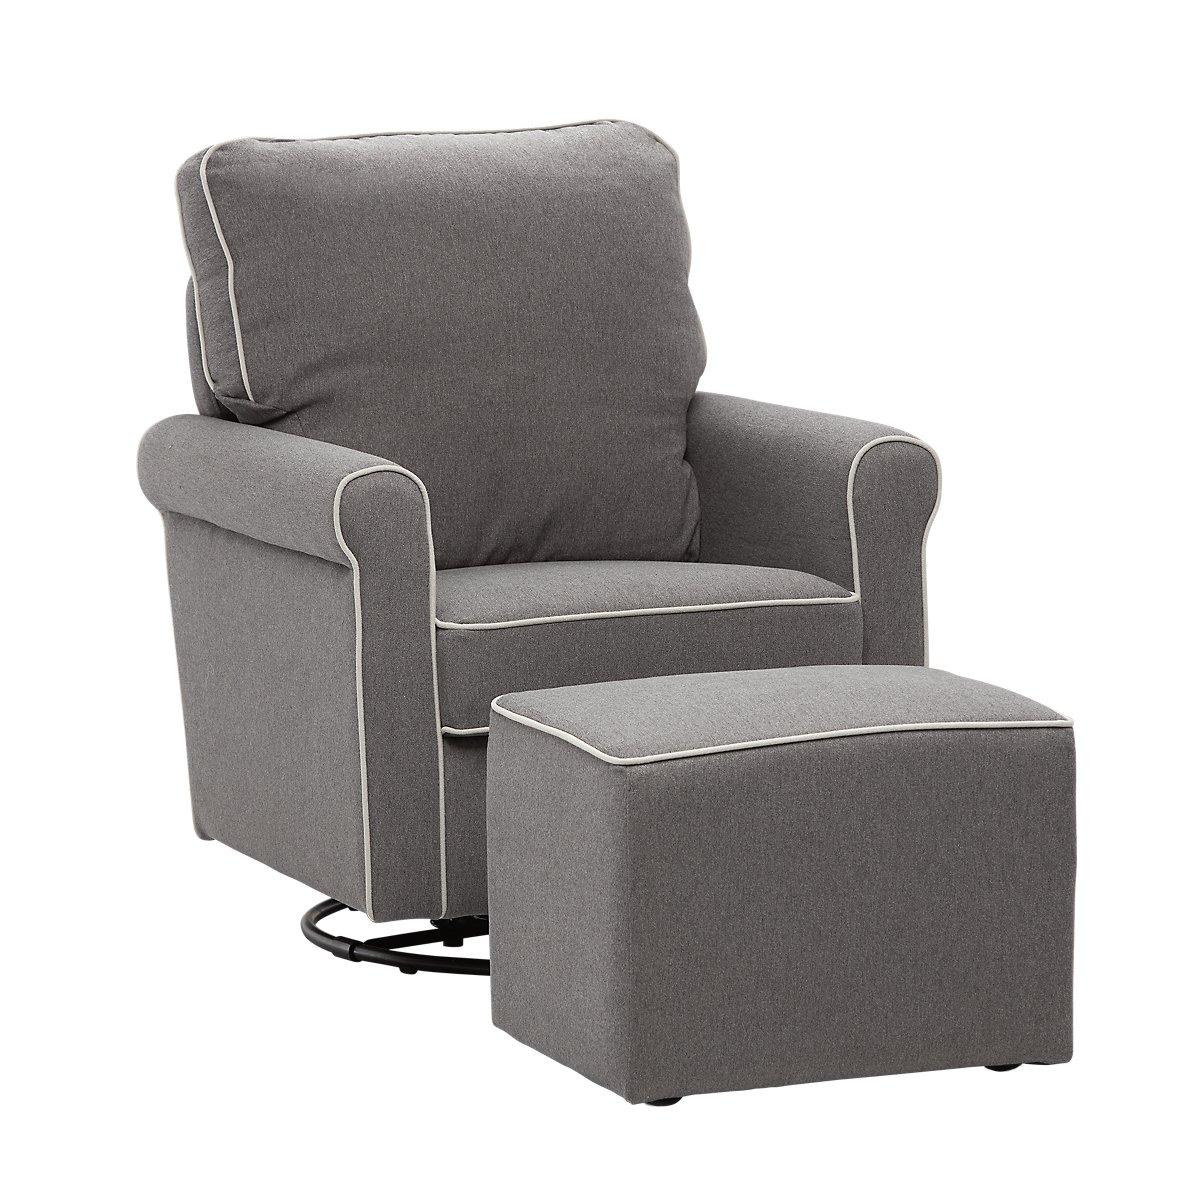 Maya Dark Gray Fabric Chair Ottoman